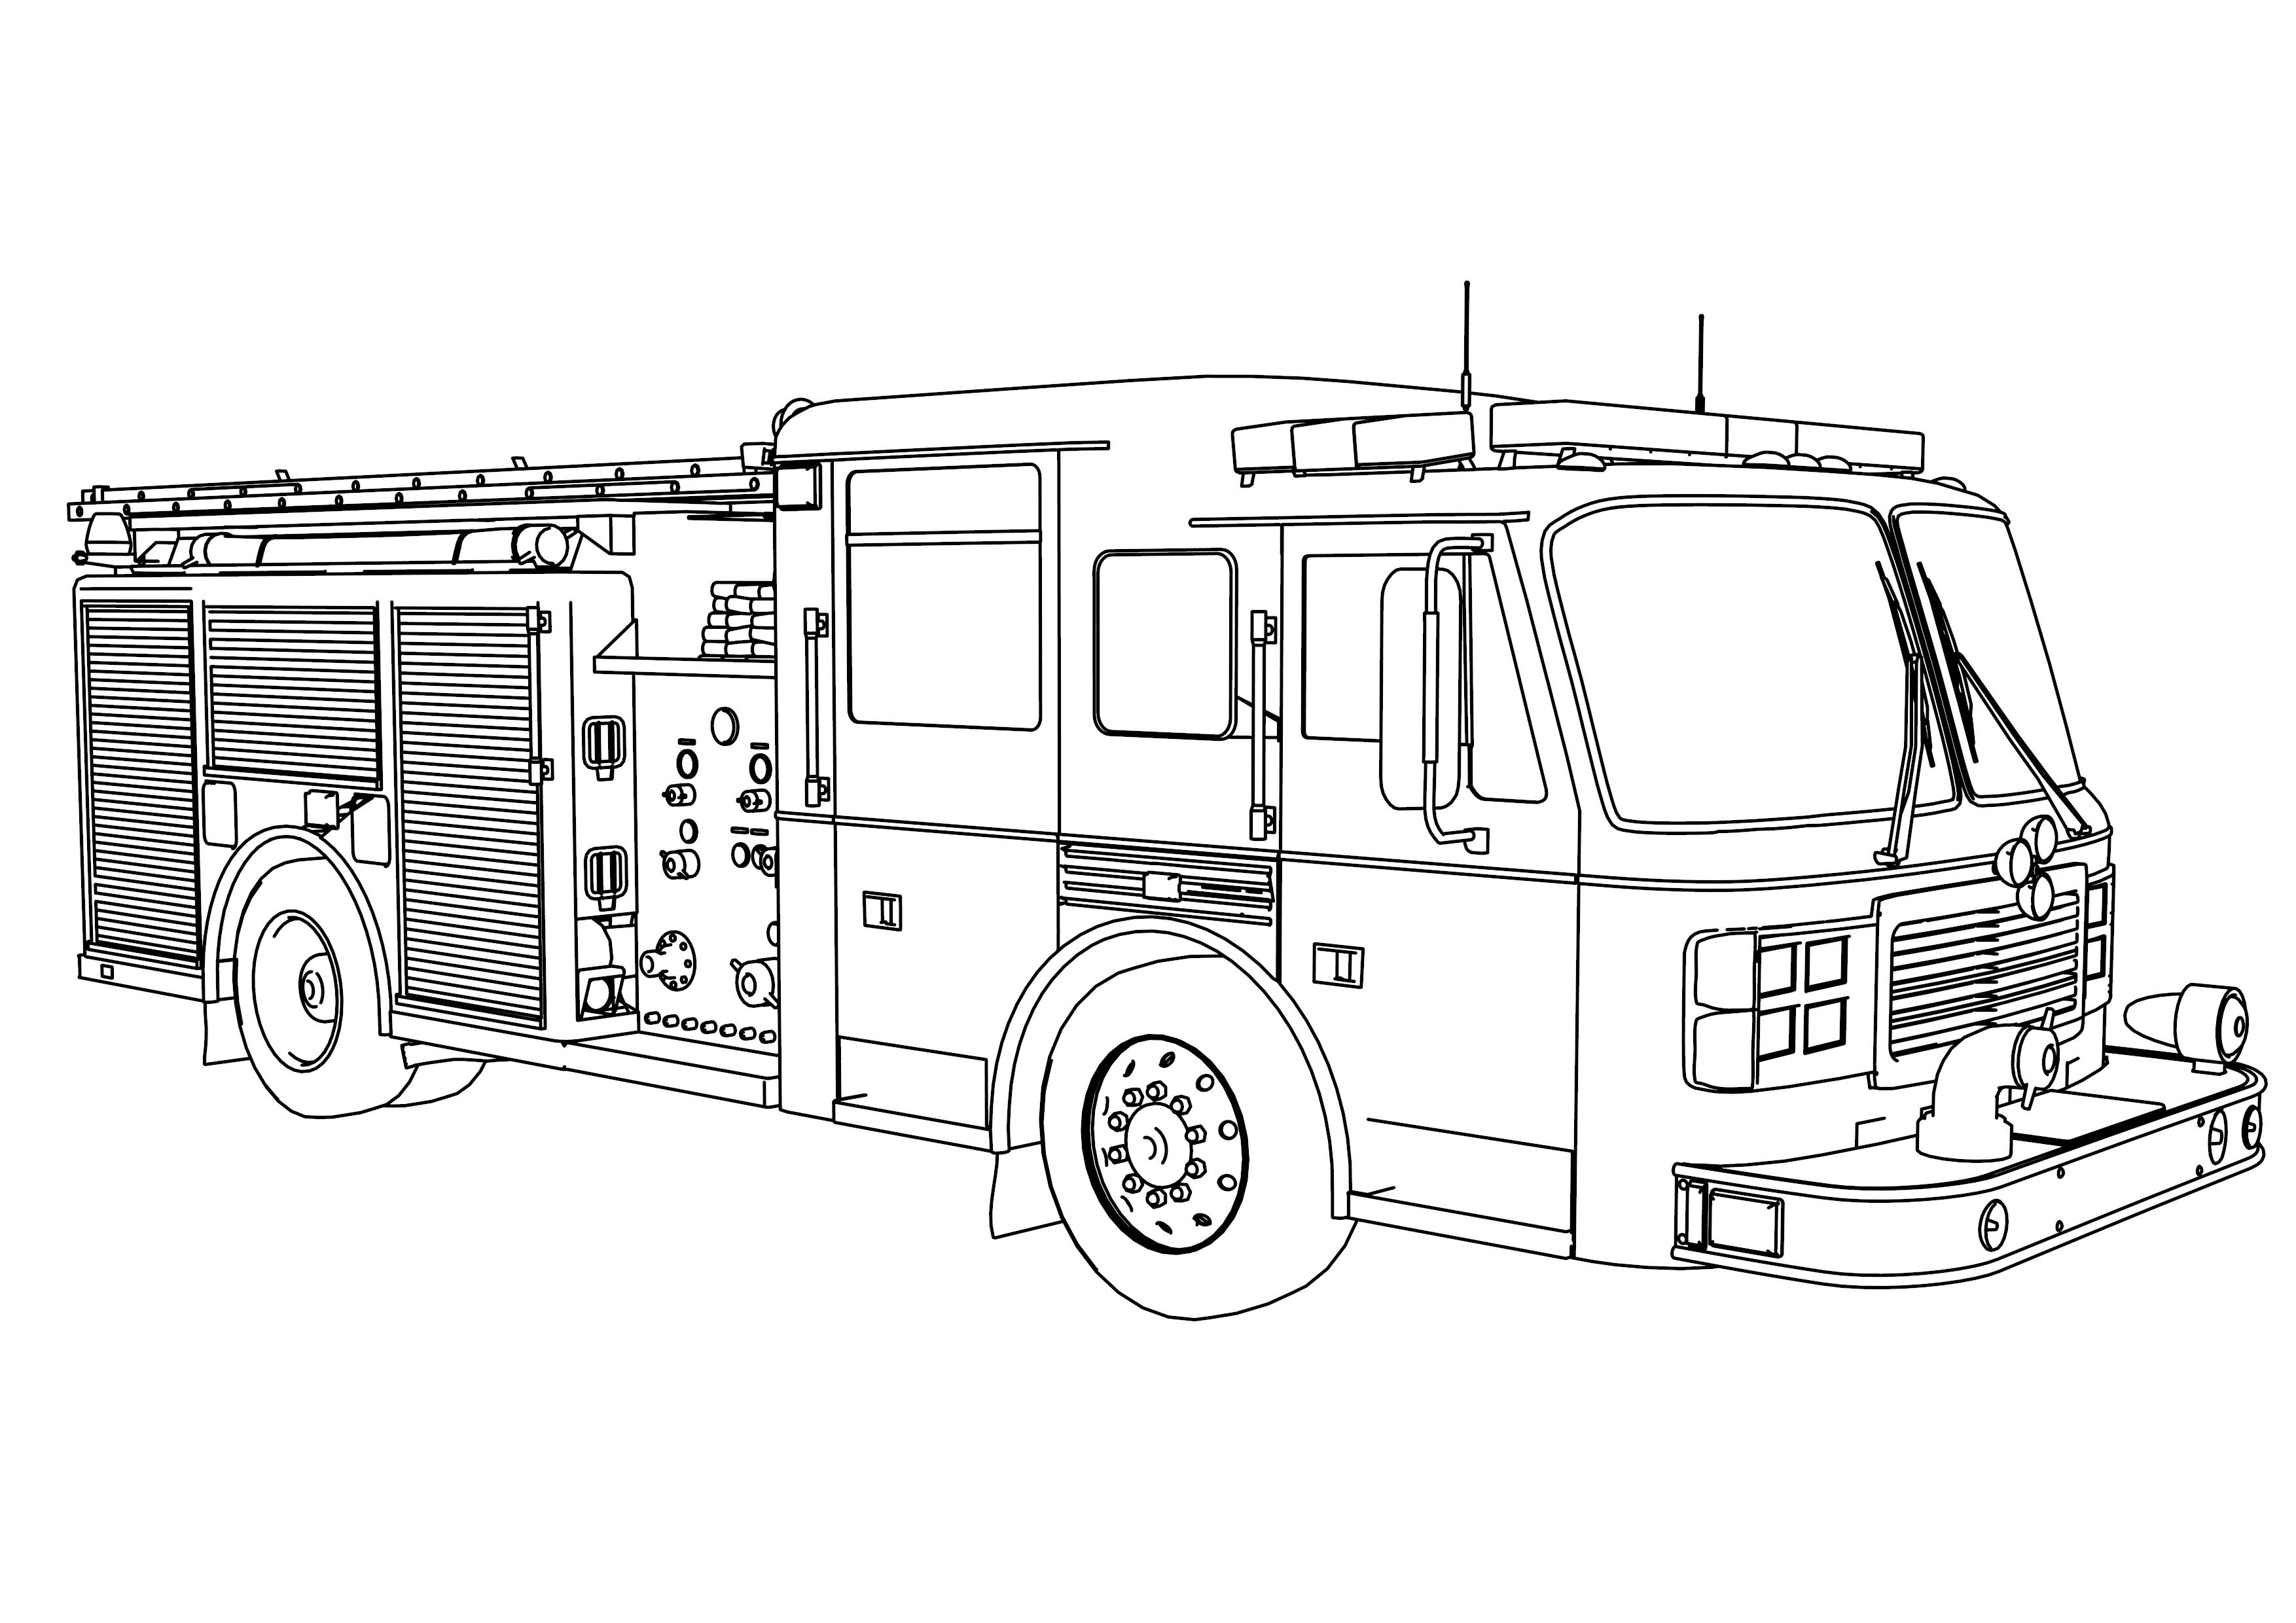 fire truck coloring page fire truck coloring pages getcoloringpagescom truck fire page coloring